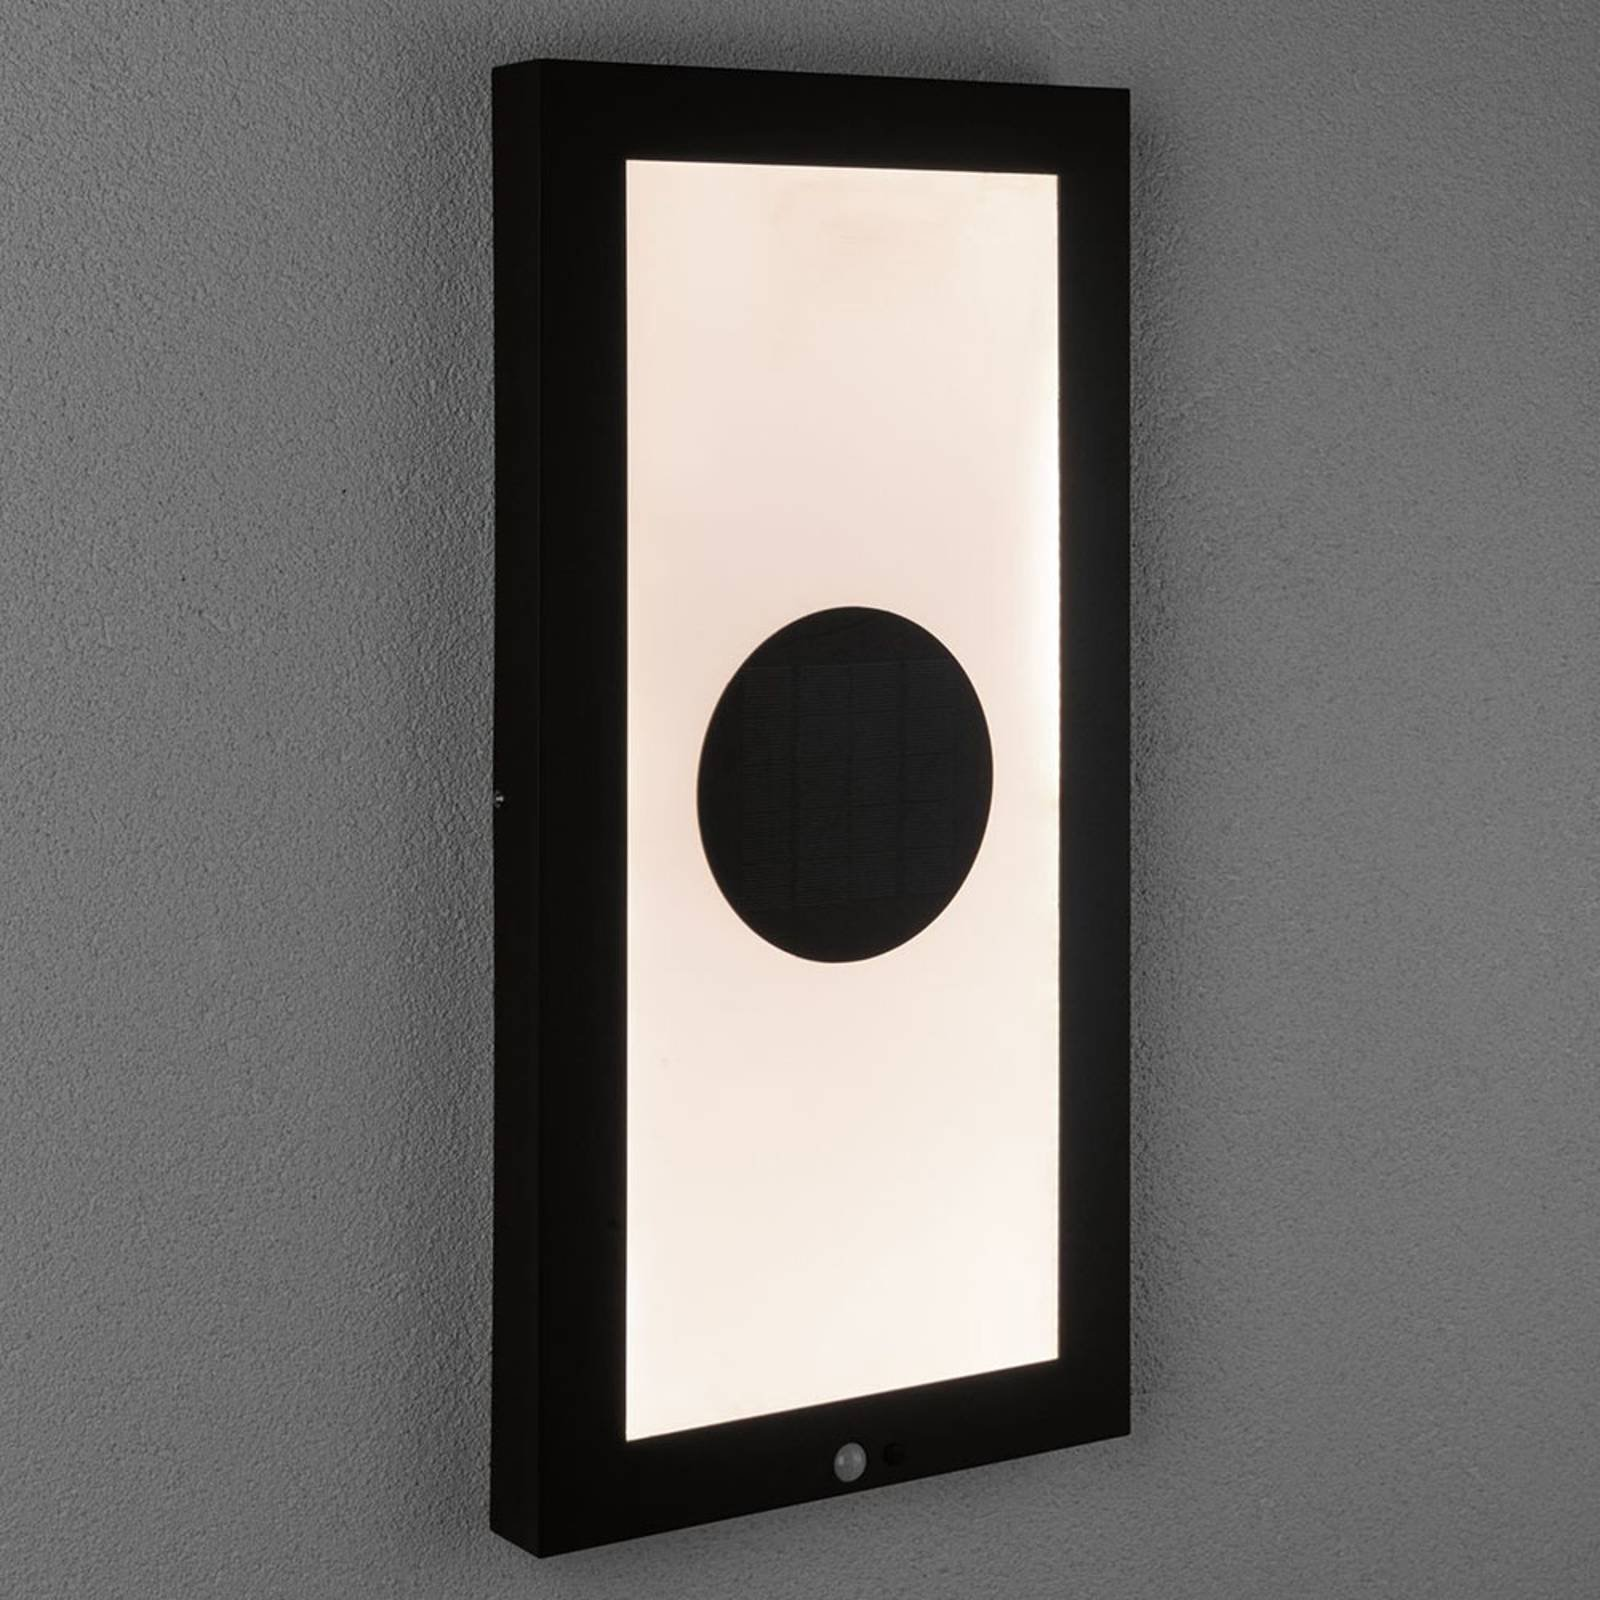 Paulmann LED-solcellepanel Taija sensor 30 x 60 cm